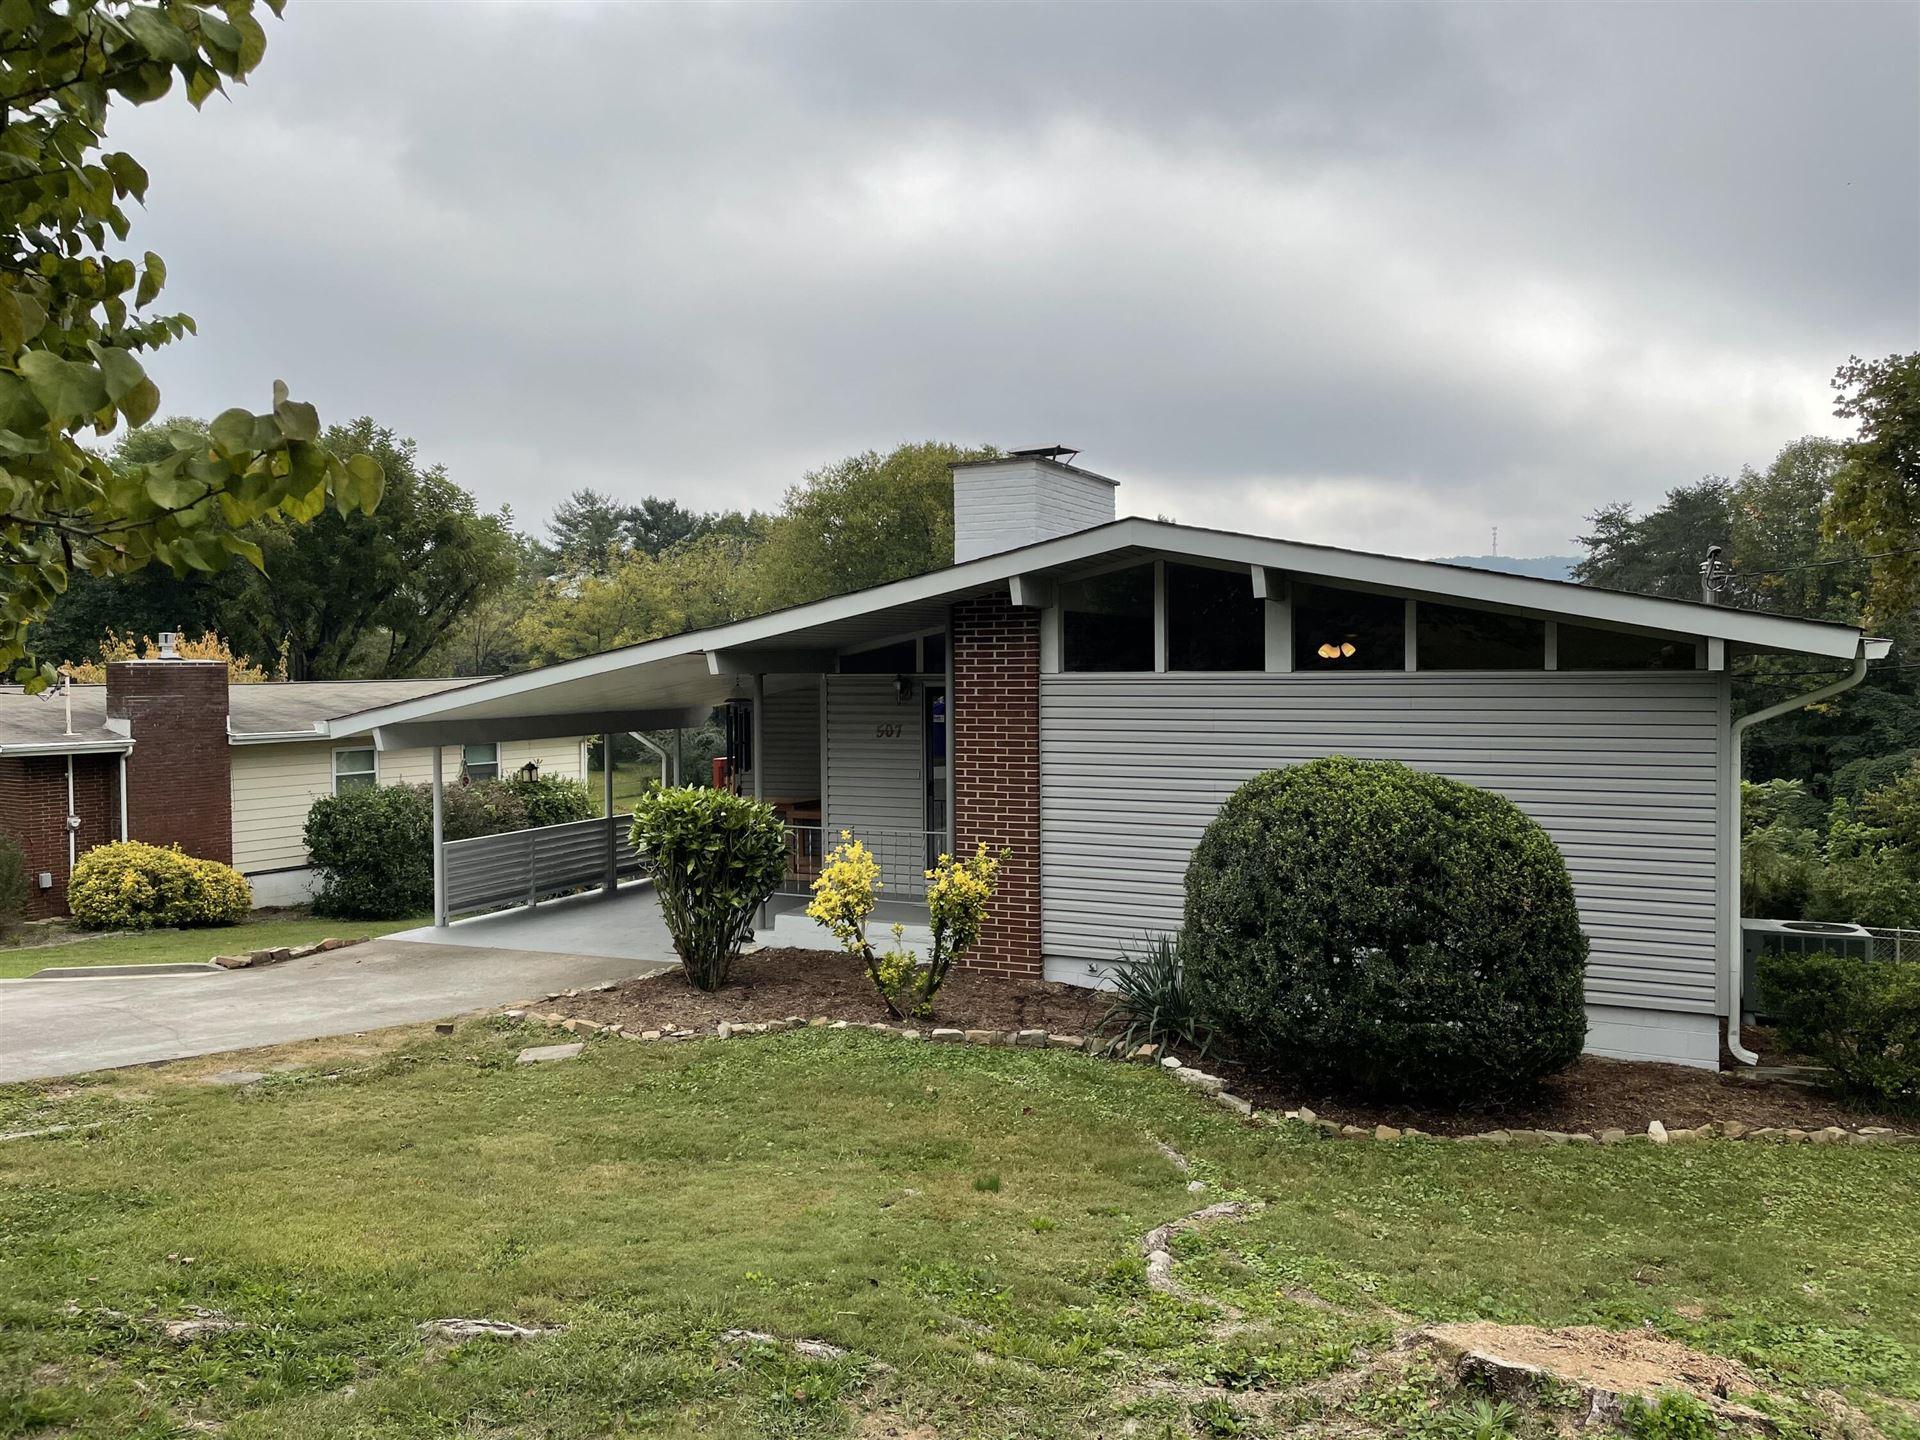 Photo of 507 Robertsville Rd, Oak Ridge, TN 37830 (MLS # 1169428)